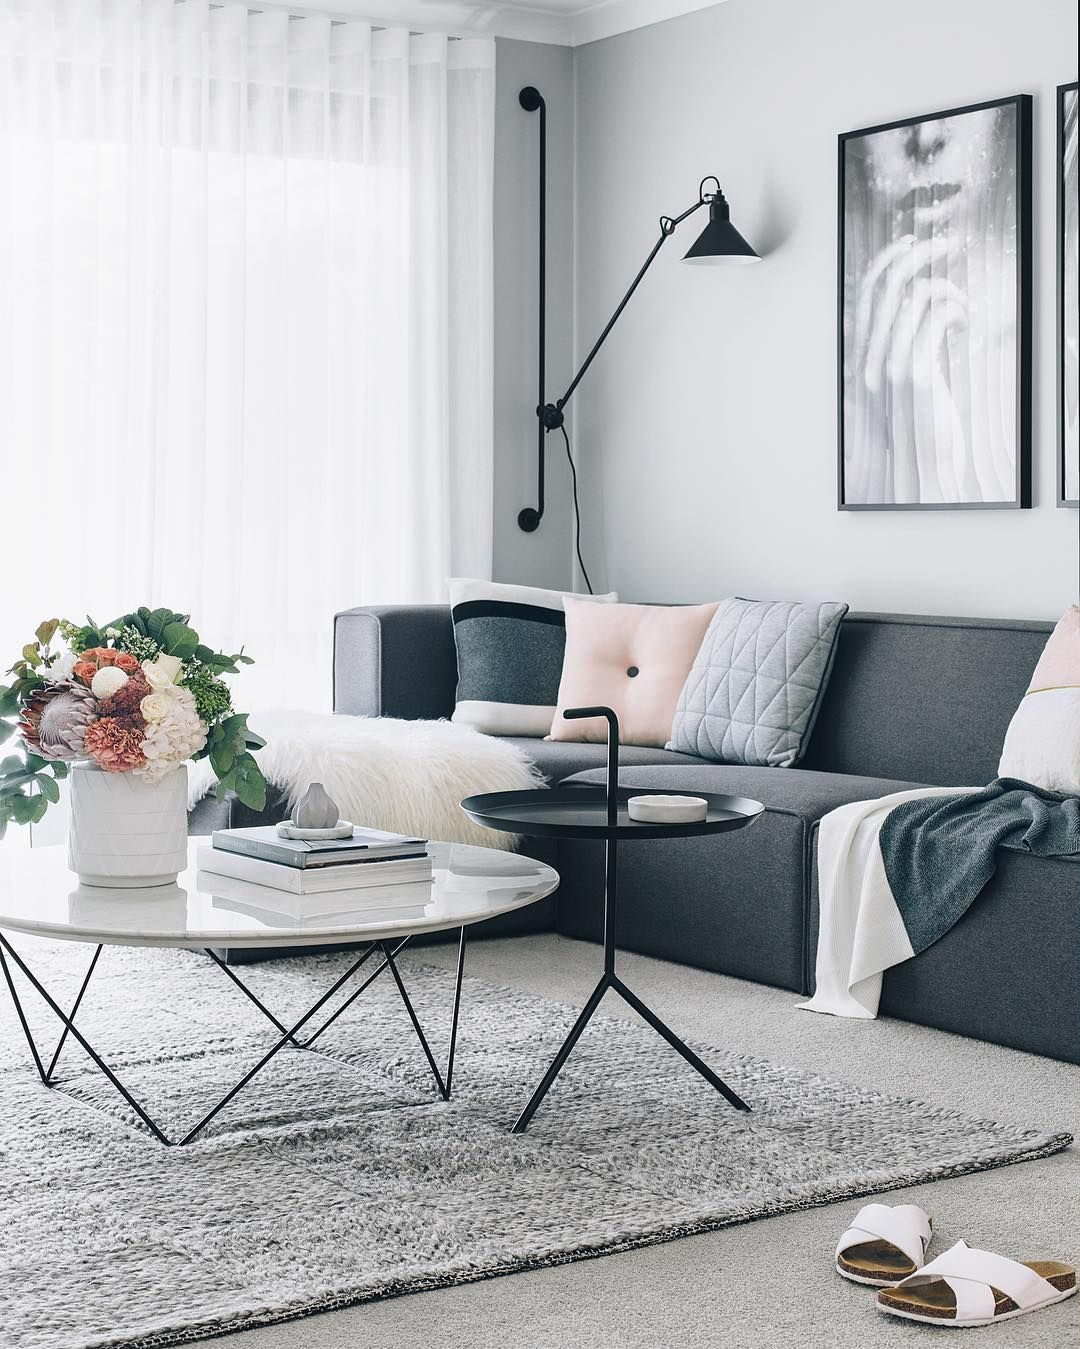 21 Living Room Decorating Ideas House Living Room Living Room